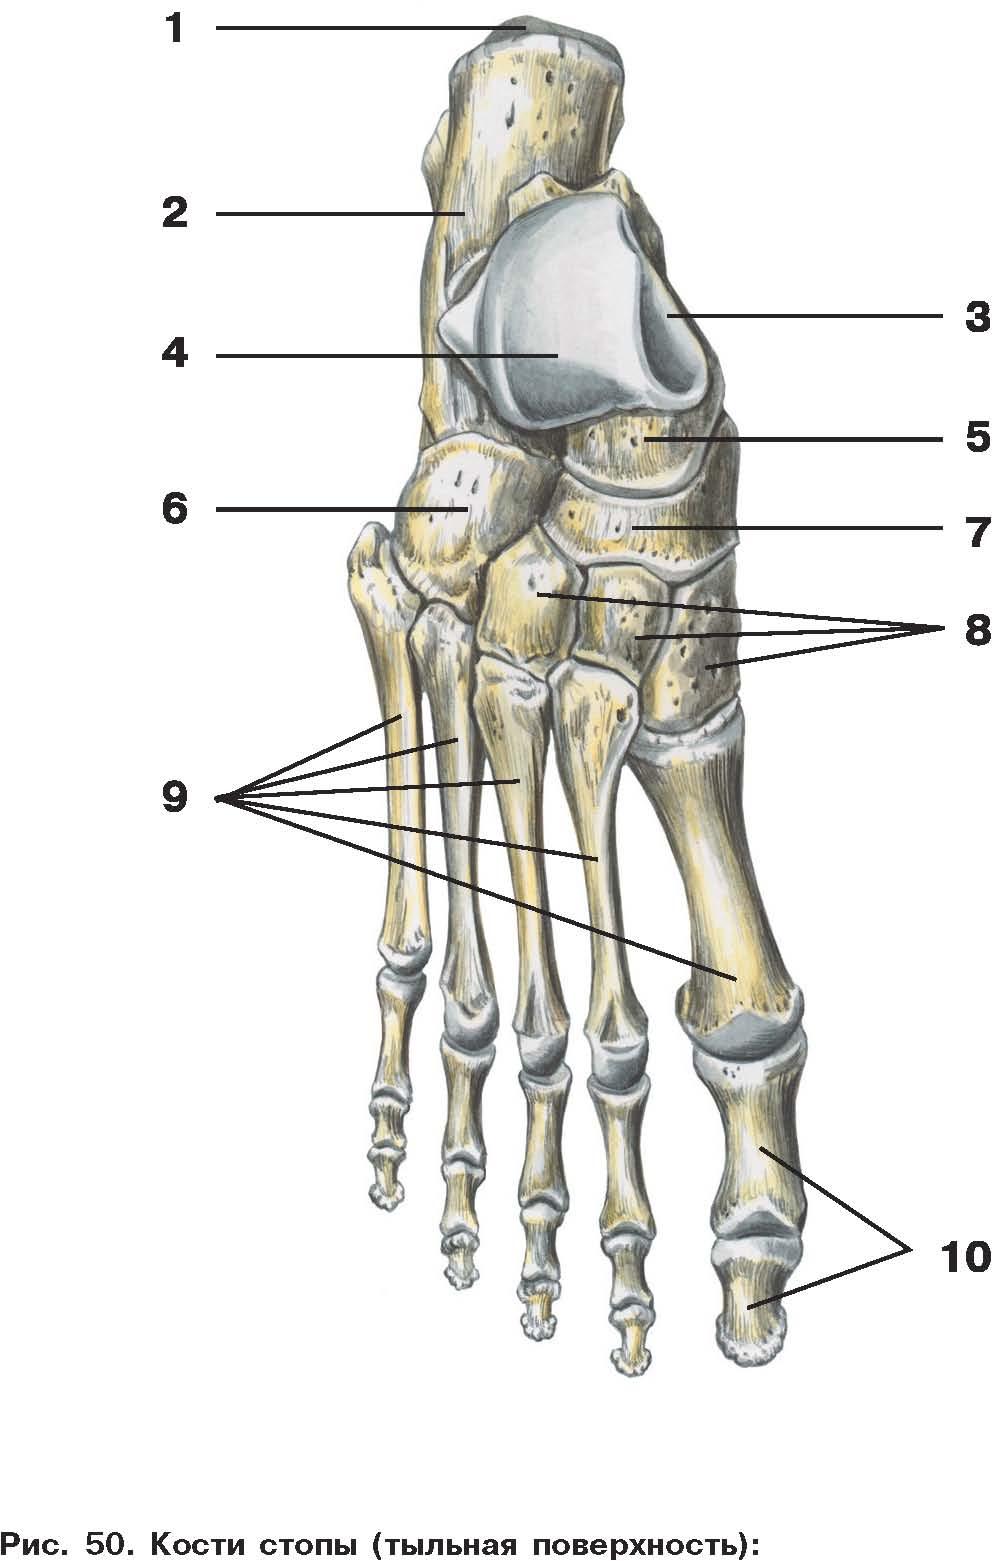 C:\Documents and Settings\Любовь\Мои документы\всё об анатомии\атласы\Атлас анатомии\image125.jpg